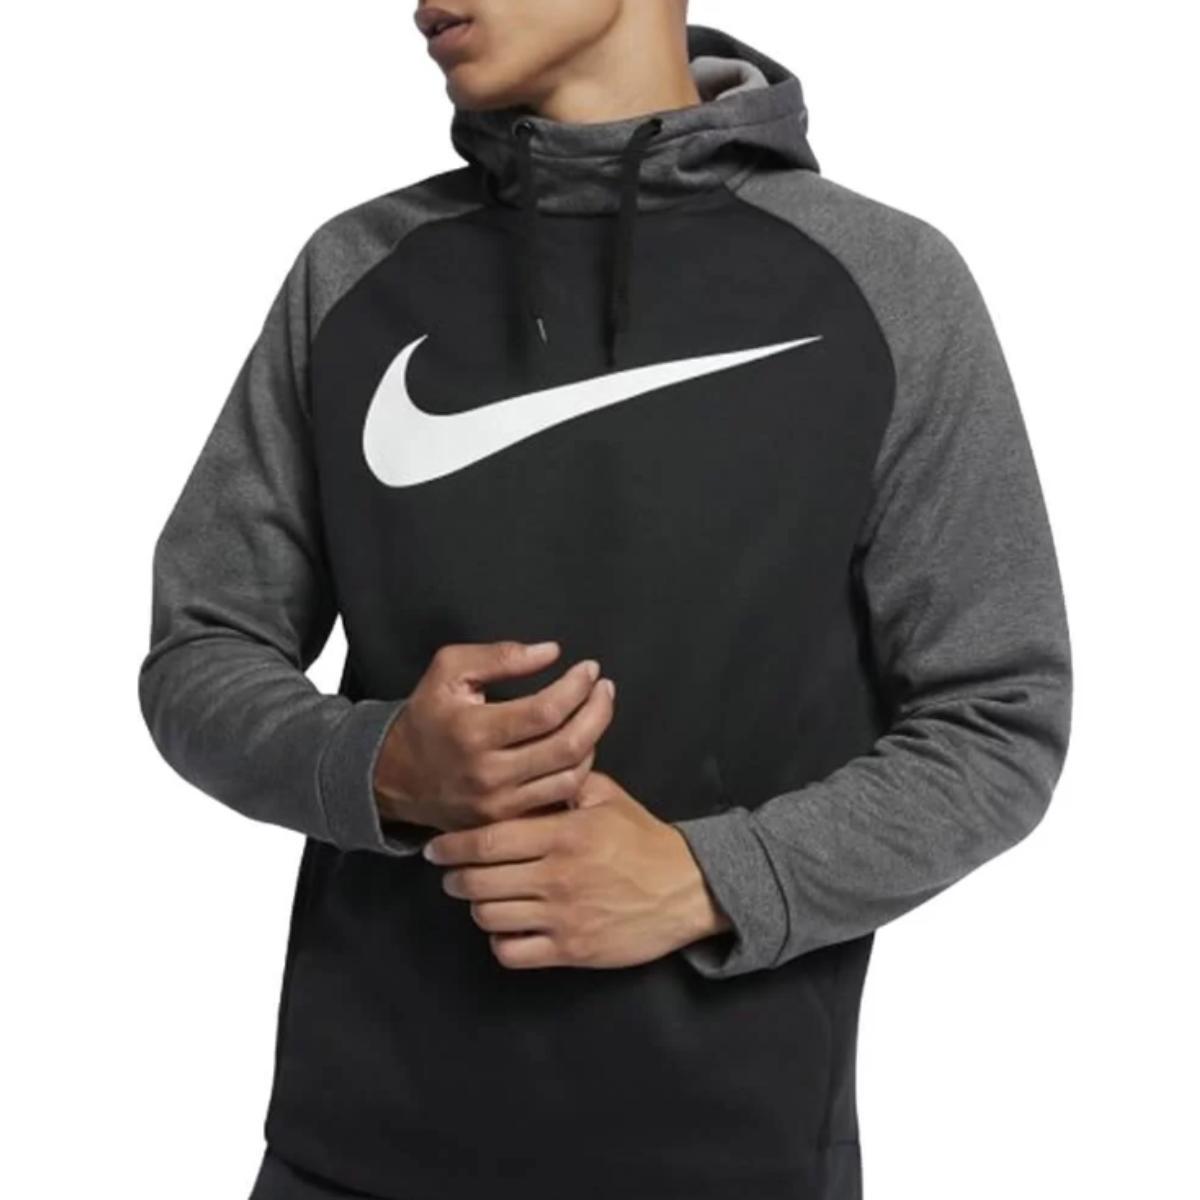 Blusão Masculino Nike 931991-010 Therma Preto/grafite